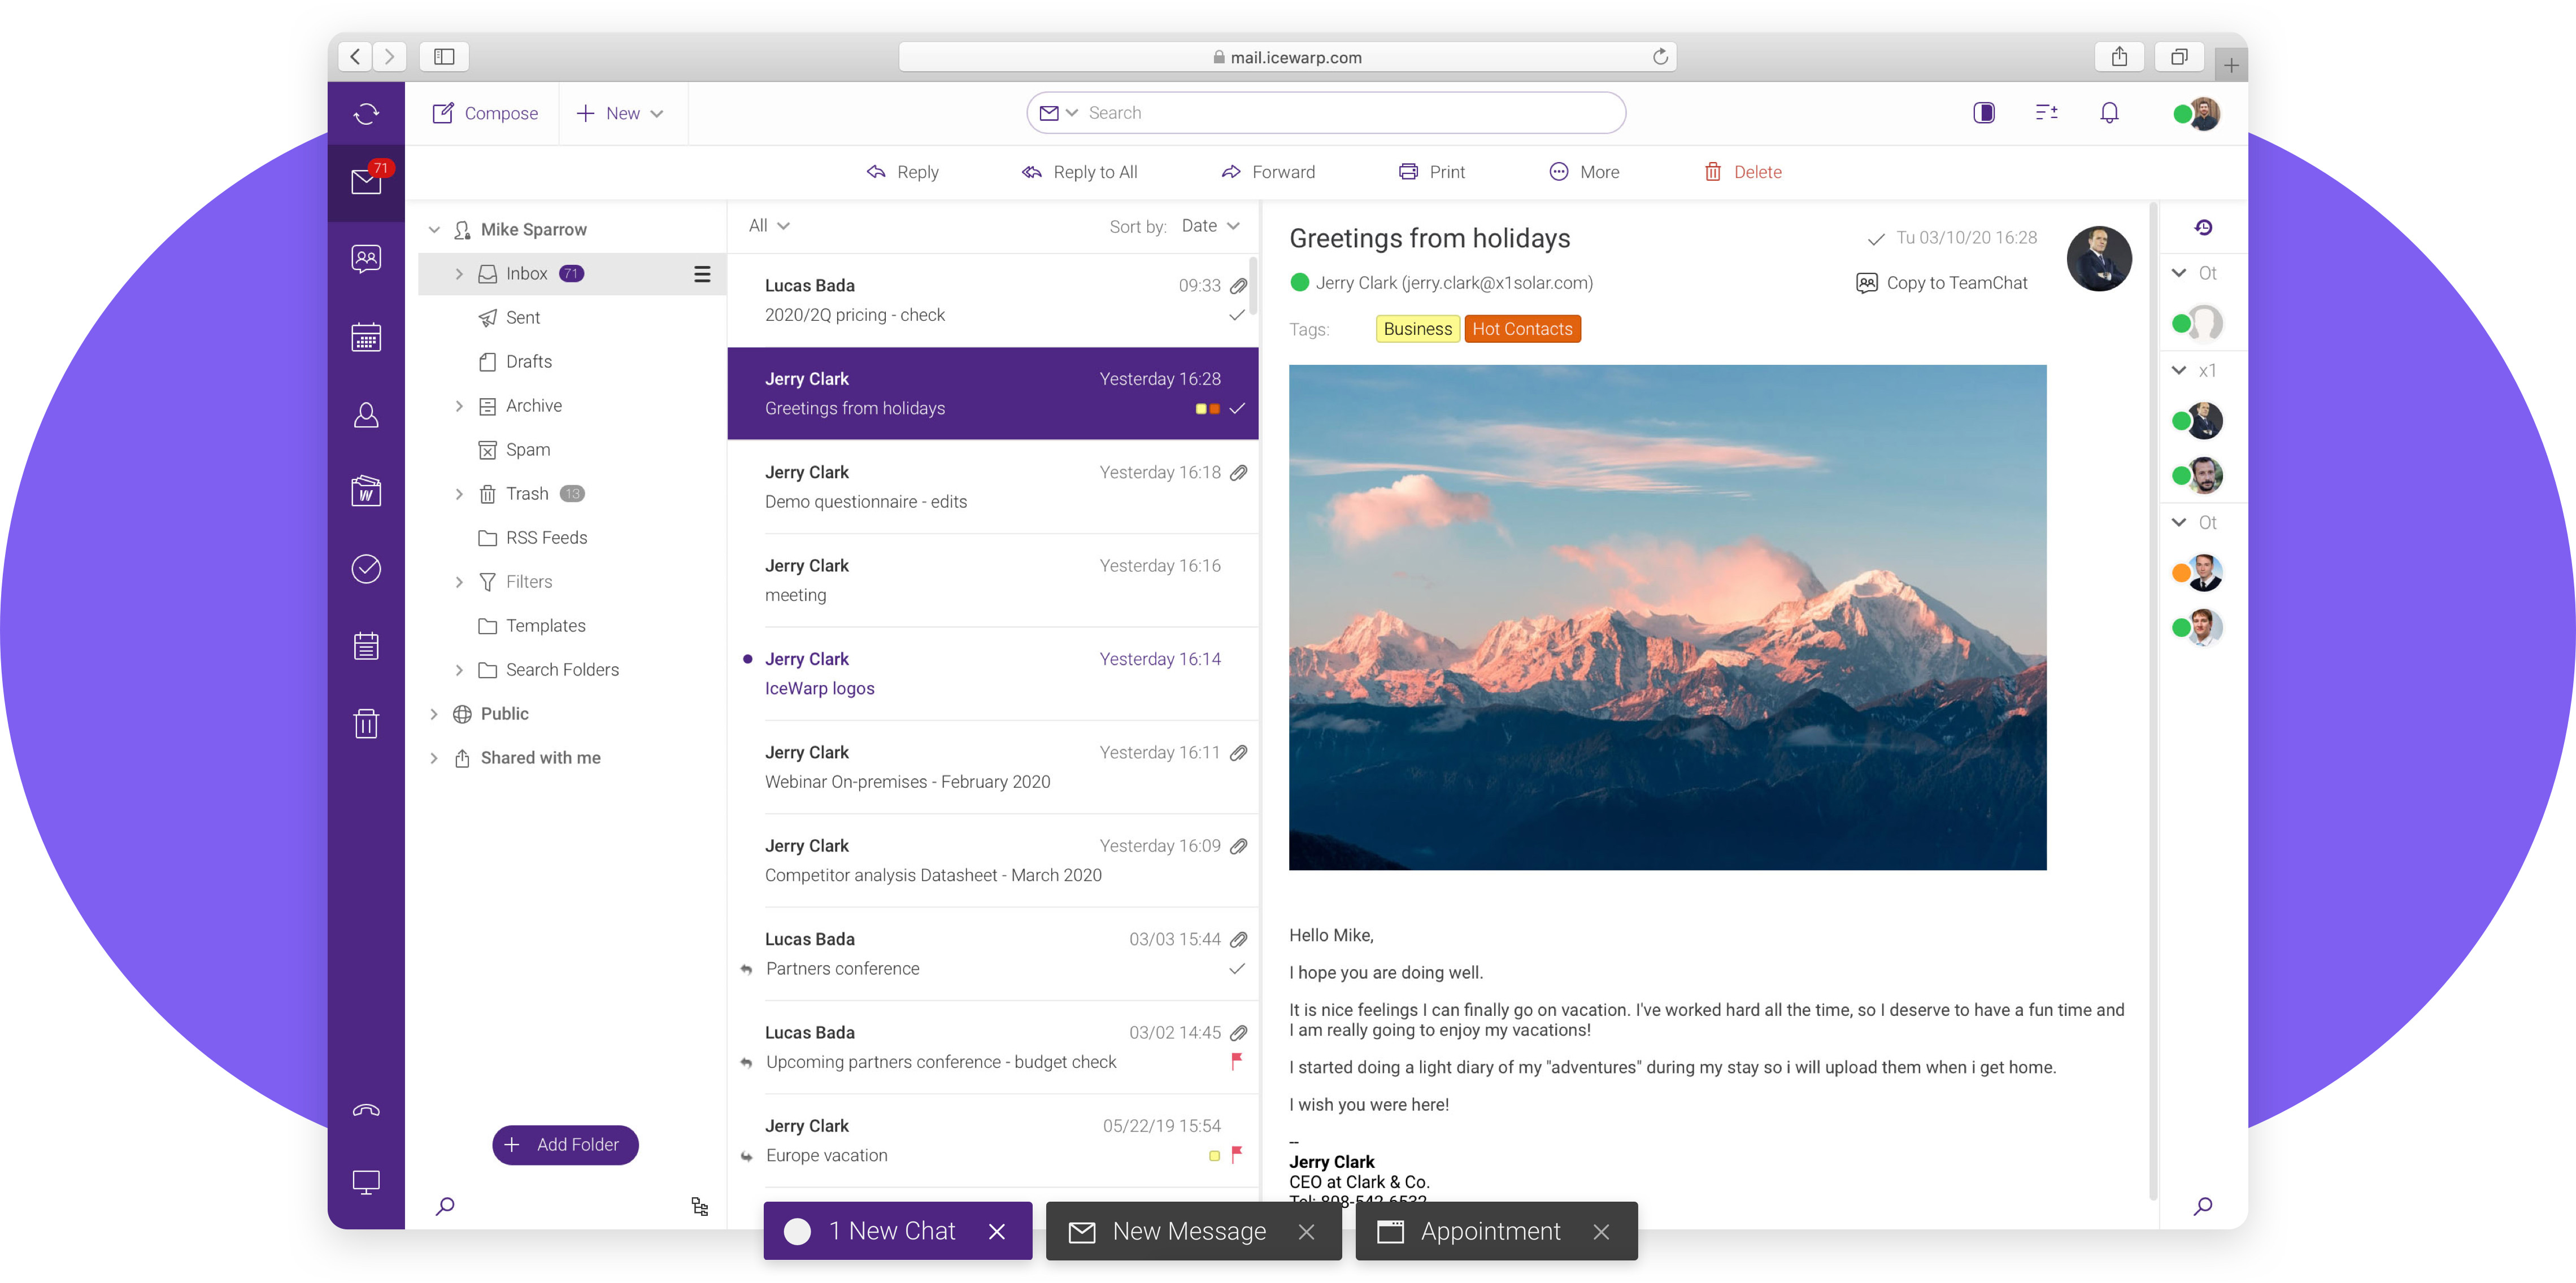 Email & multitask